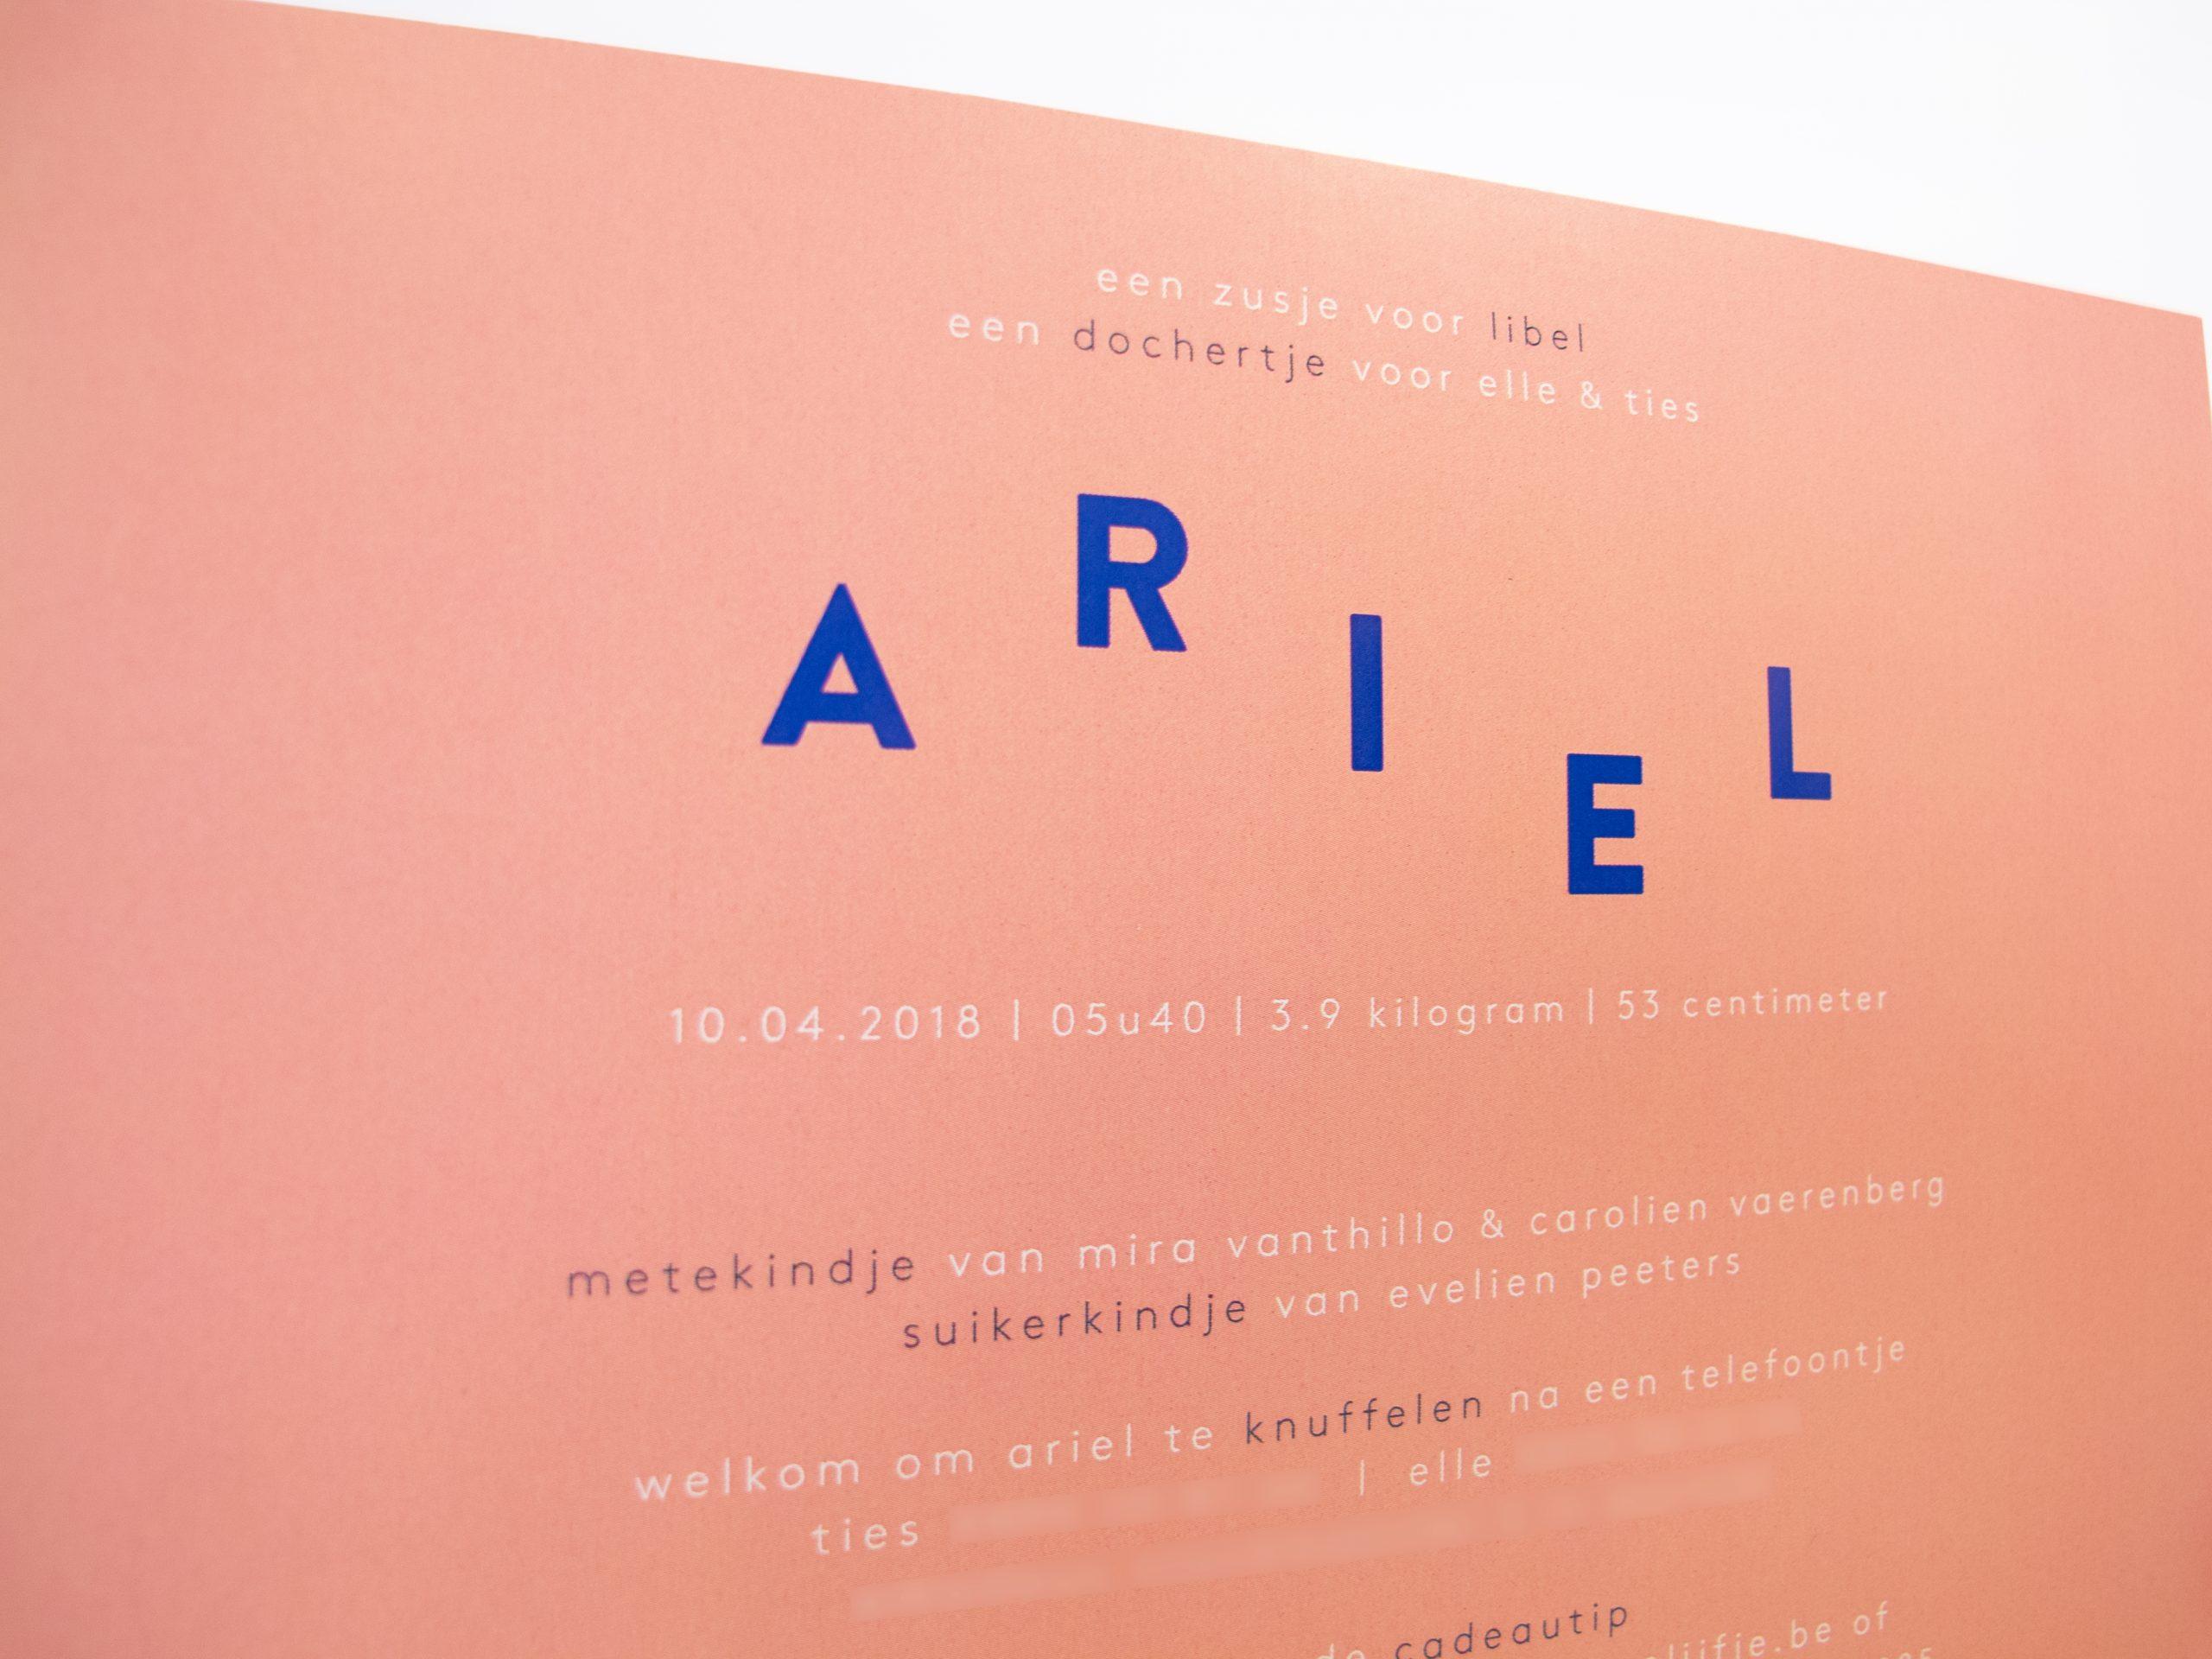 Ariel_3